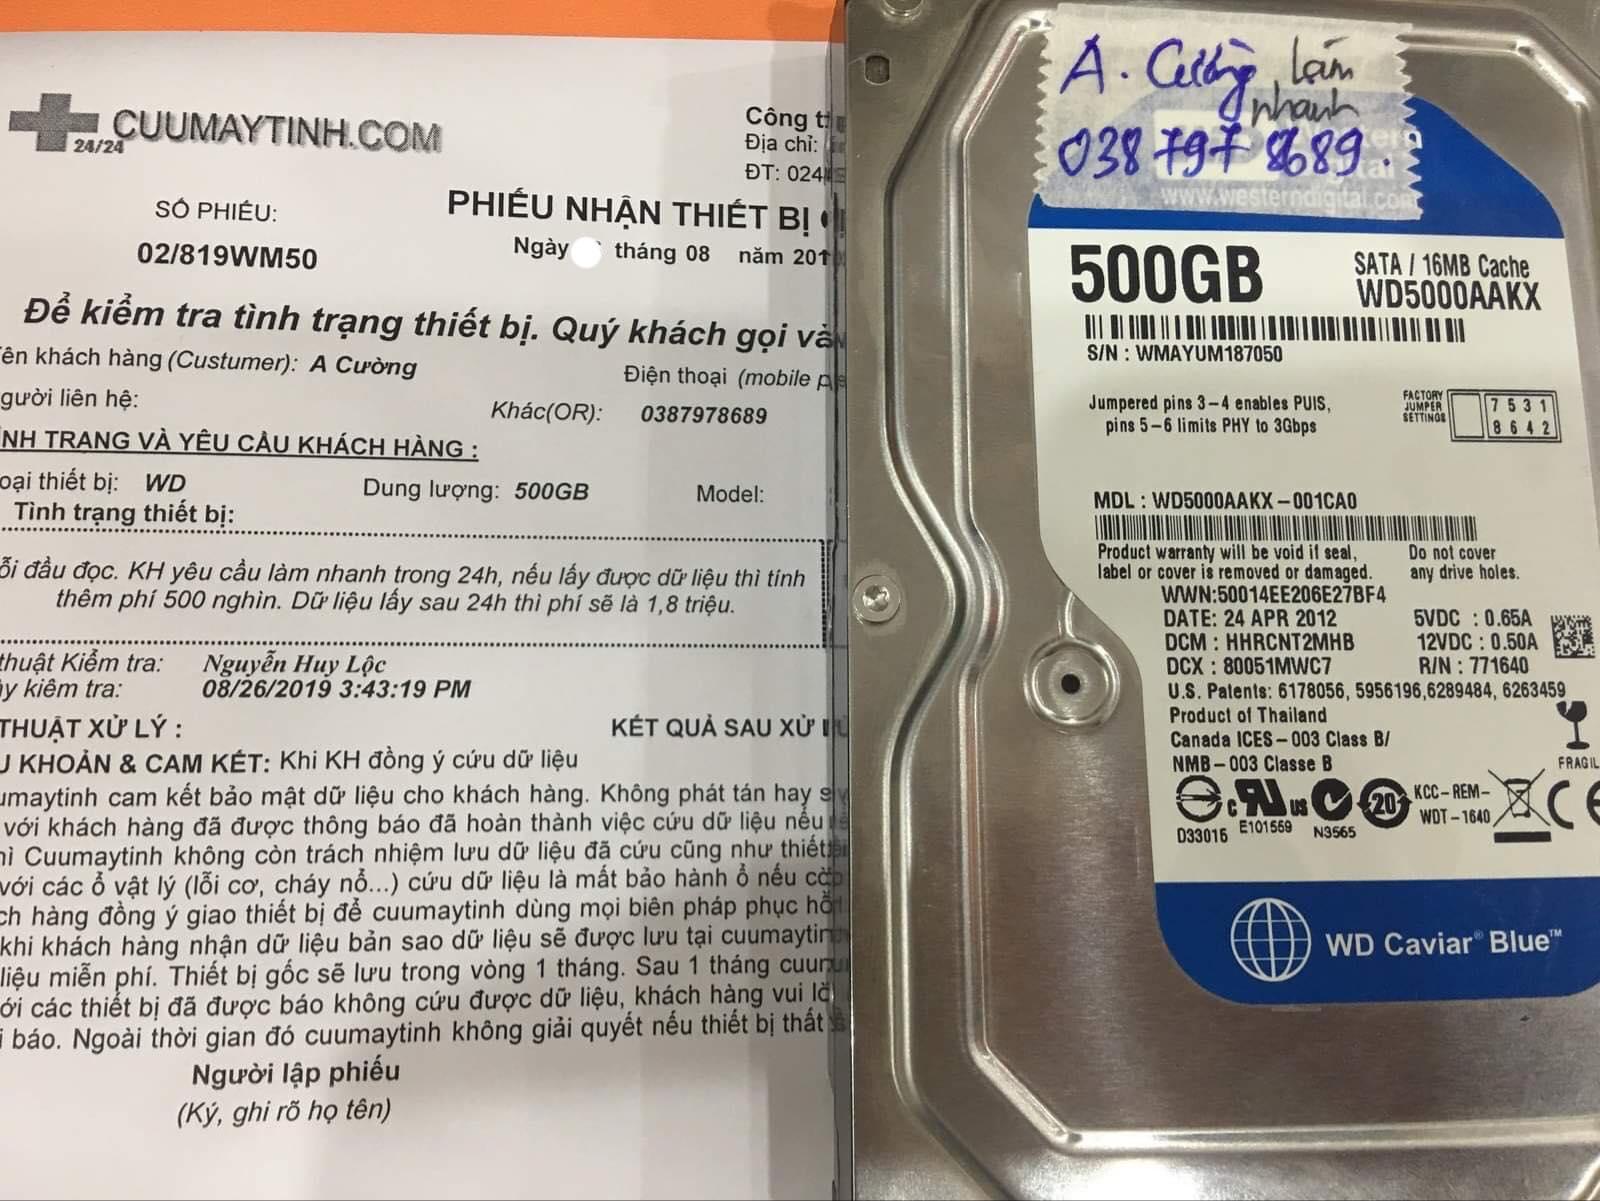 Lấy dữ liệu ổ cứng Western 500GB lỗi đầu đọc 03/09/2019 - cuumaytinh